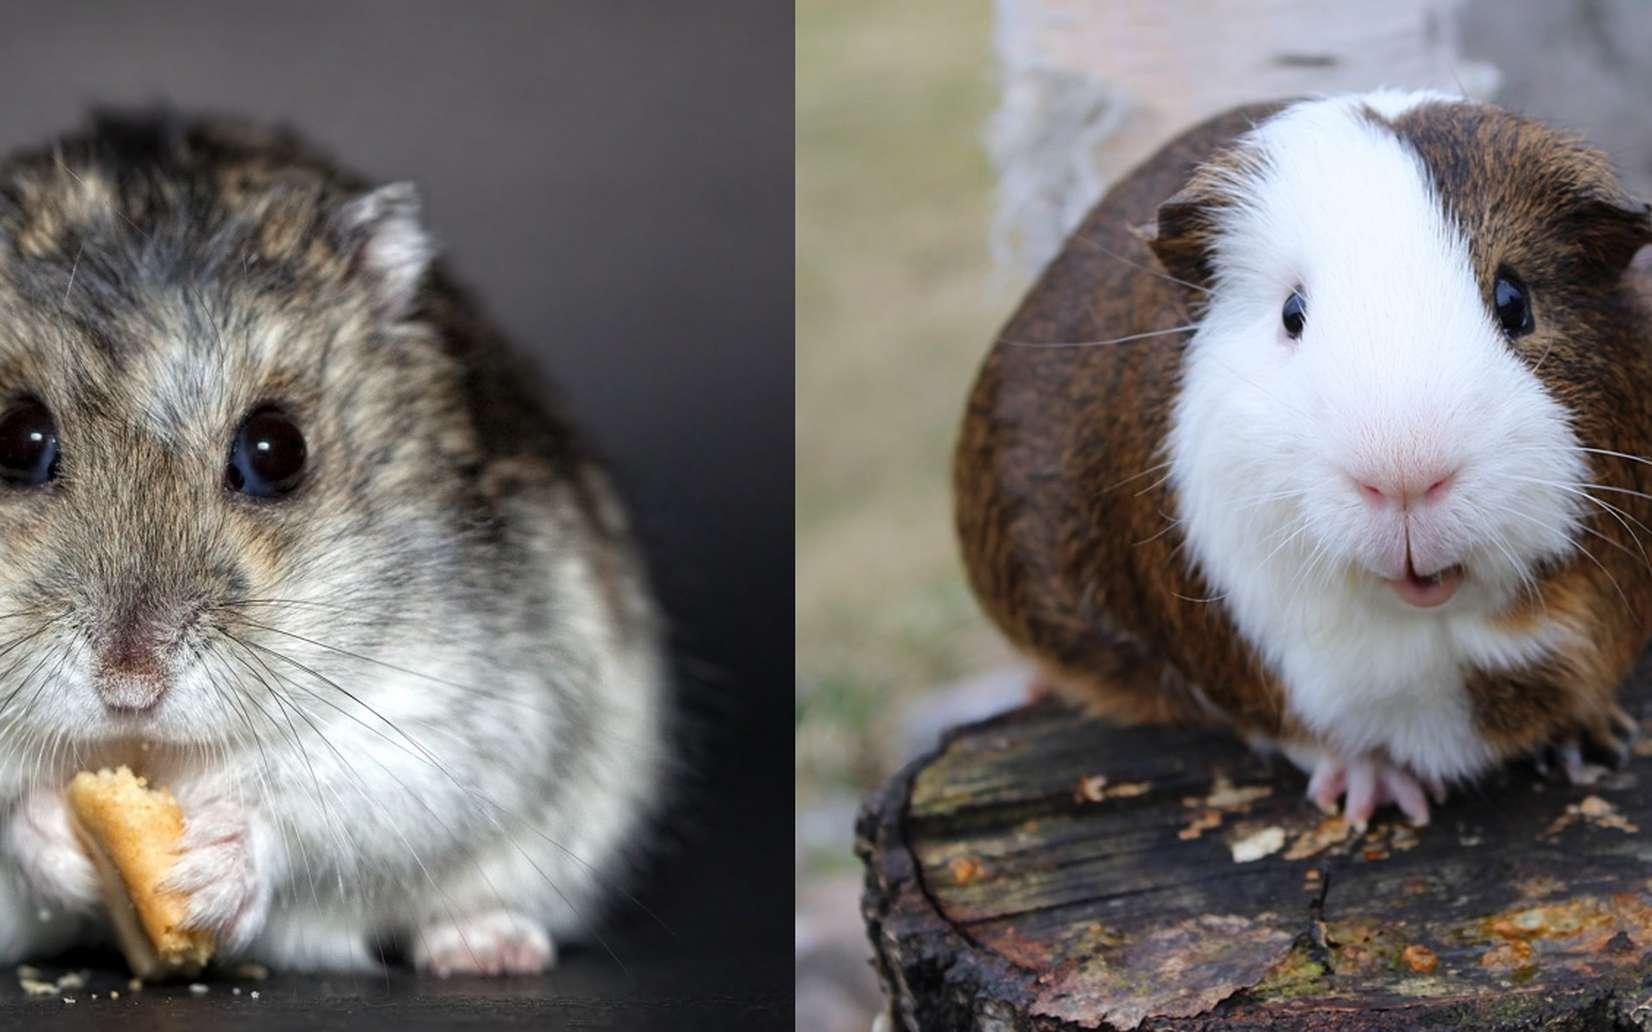 Le cochon d'Inde est beaucoup plus gros que le hamster. © Christine Trexer, Pixabay/Andy Miccone, Flickr